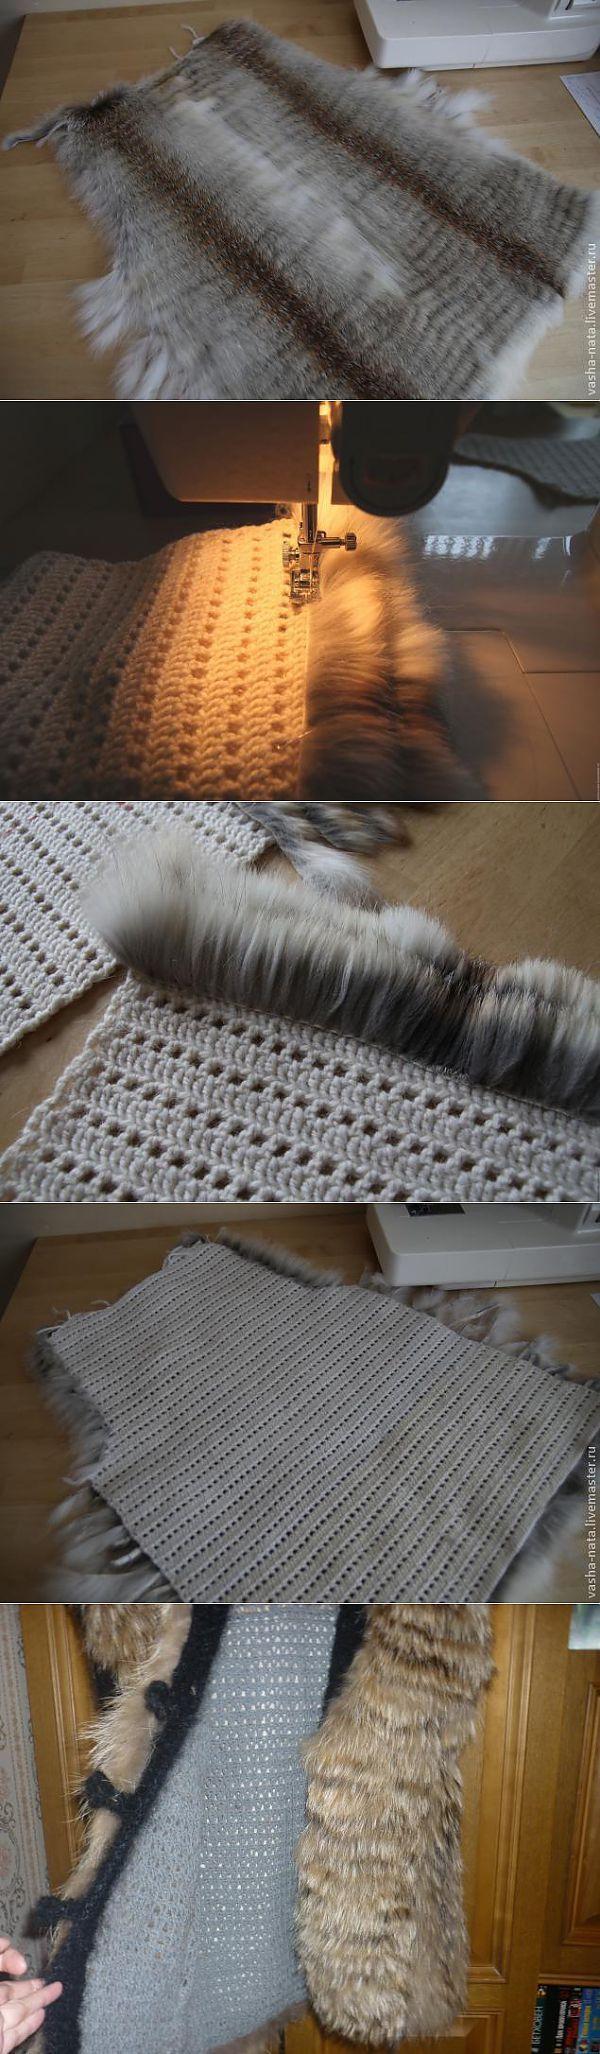 Полосочки меха пришитые на трикотаж